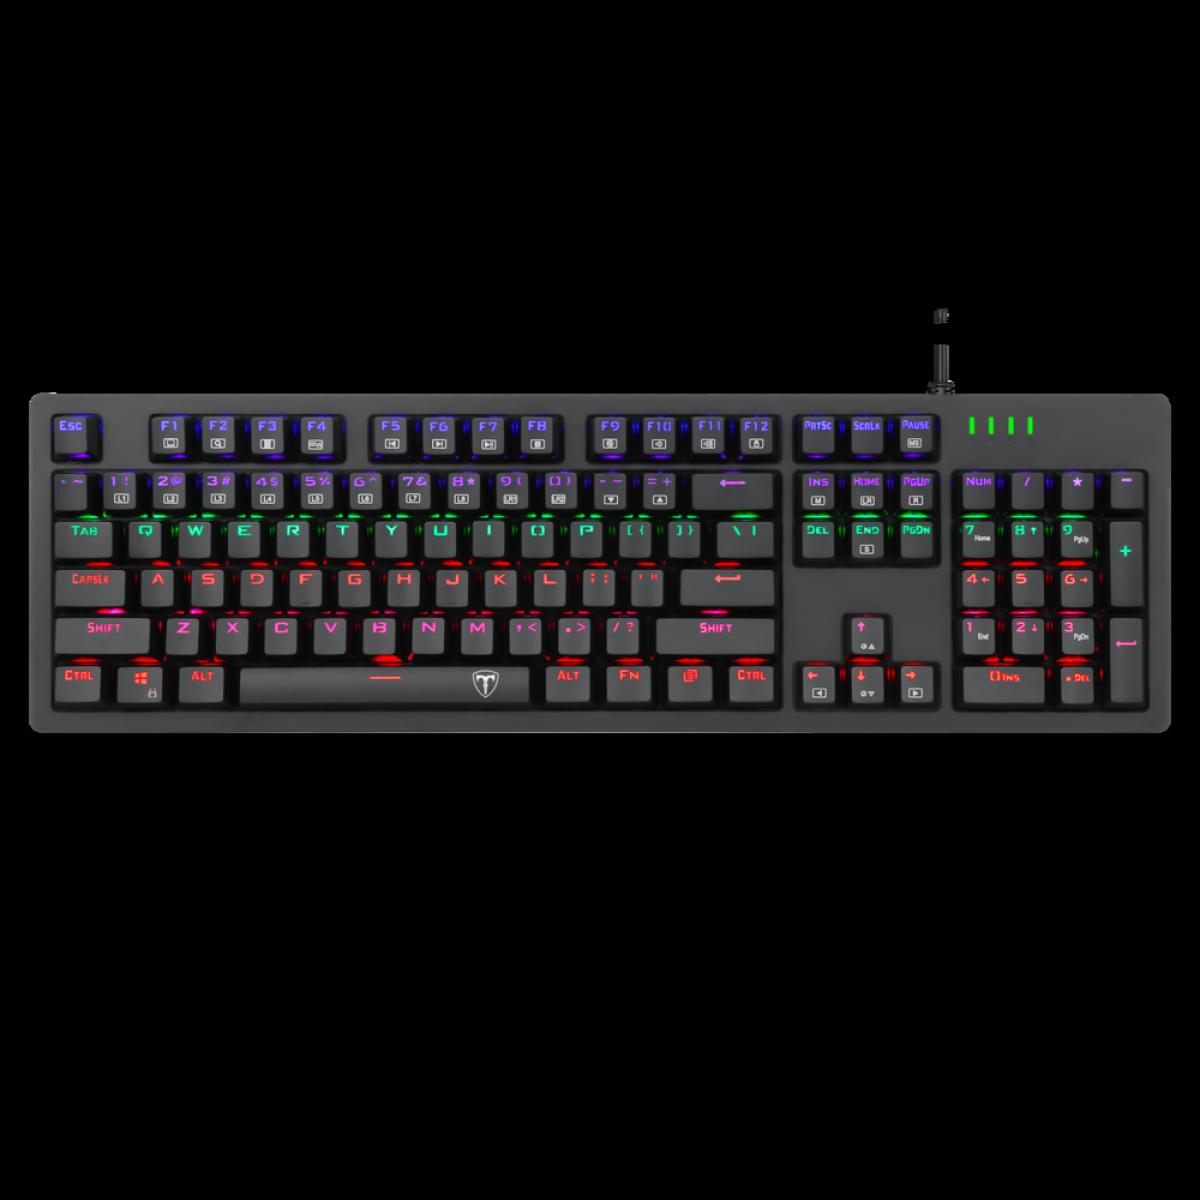 Teclado Gamer Mecânico T-Dagger Bermuda, RGB, Switch Brown, Black, ABNT2, T-TGK312-BR